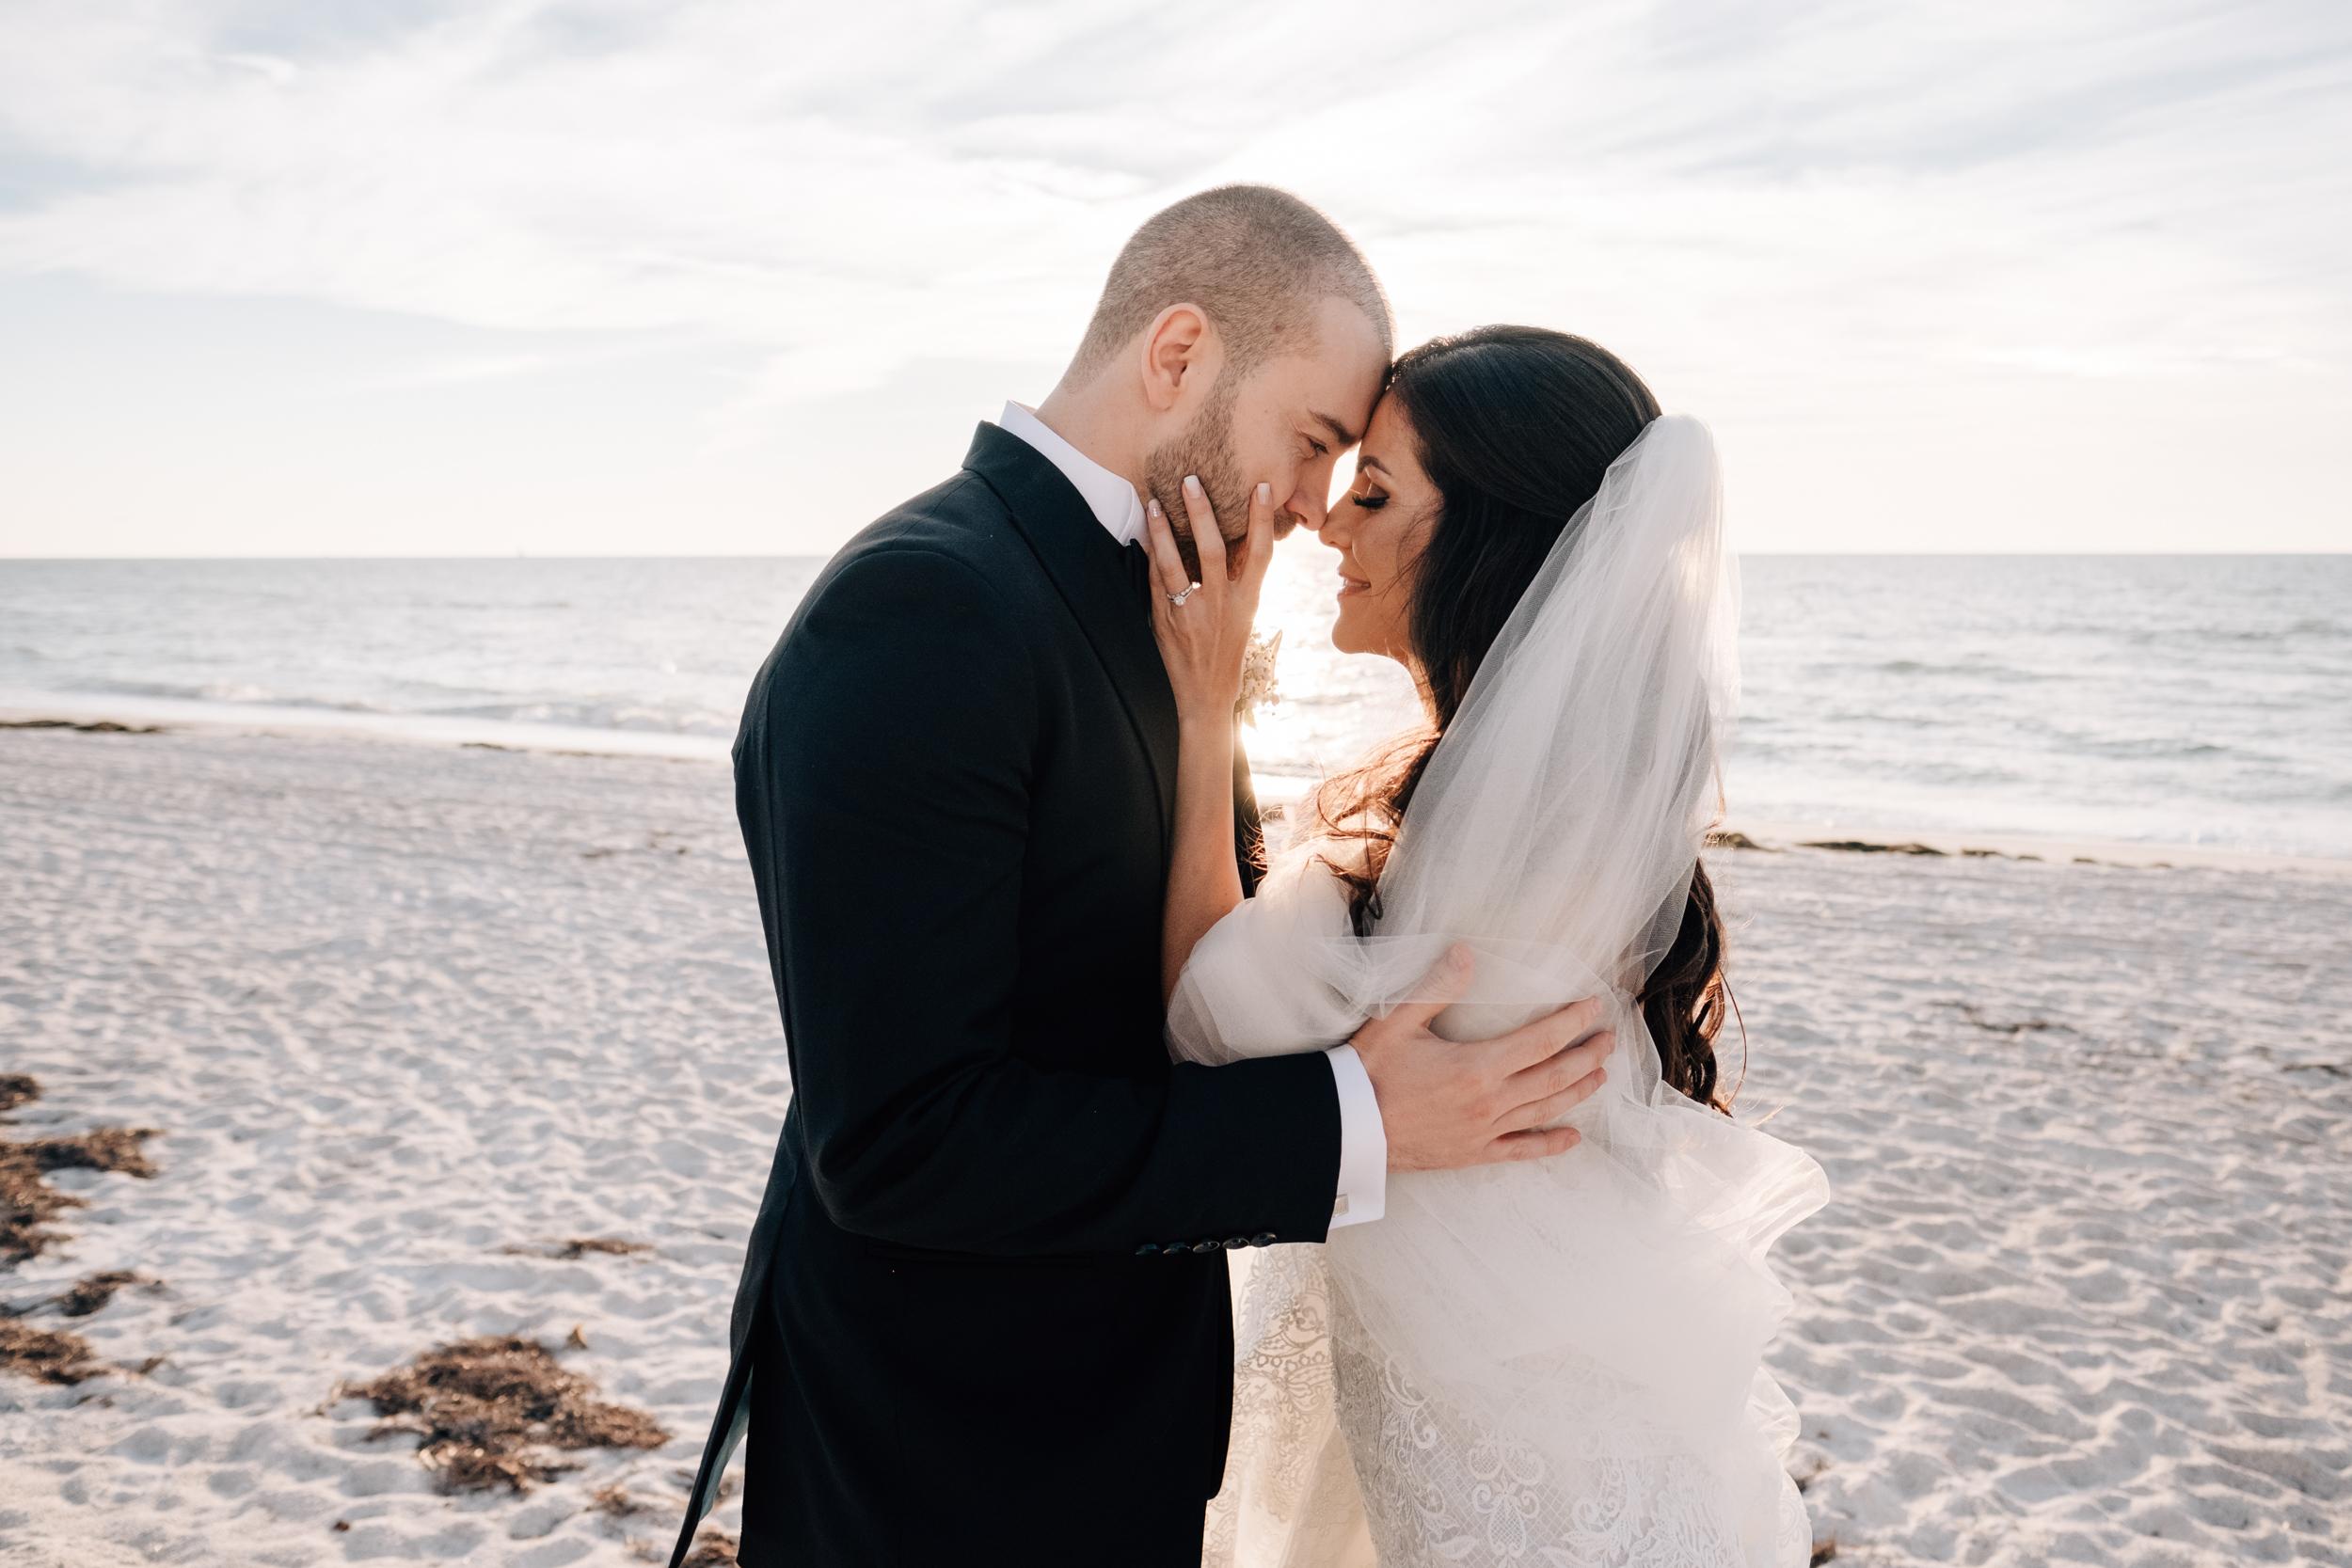 Amethyst Weddings - Georgi and Mariana 081.jpg